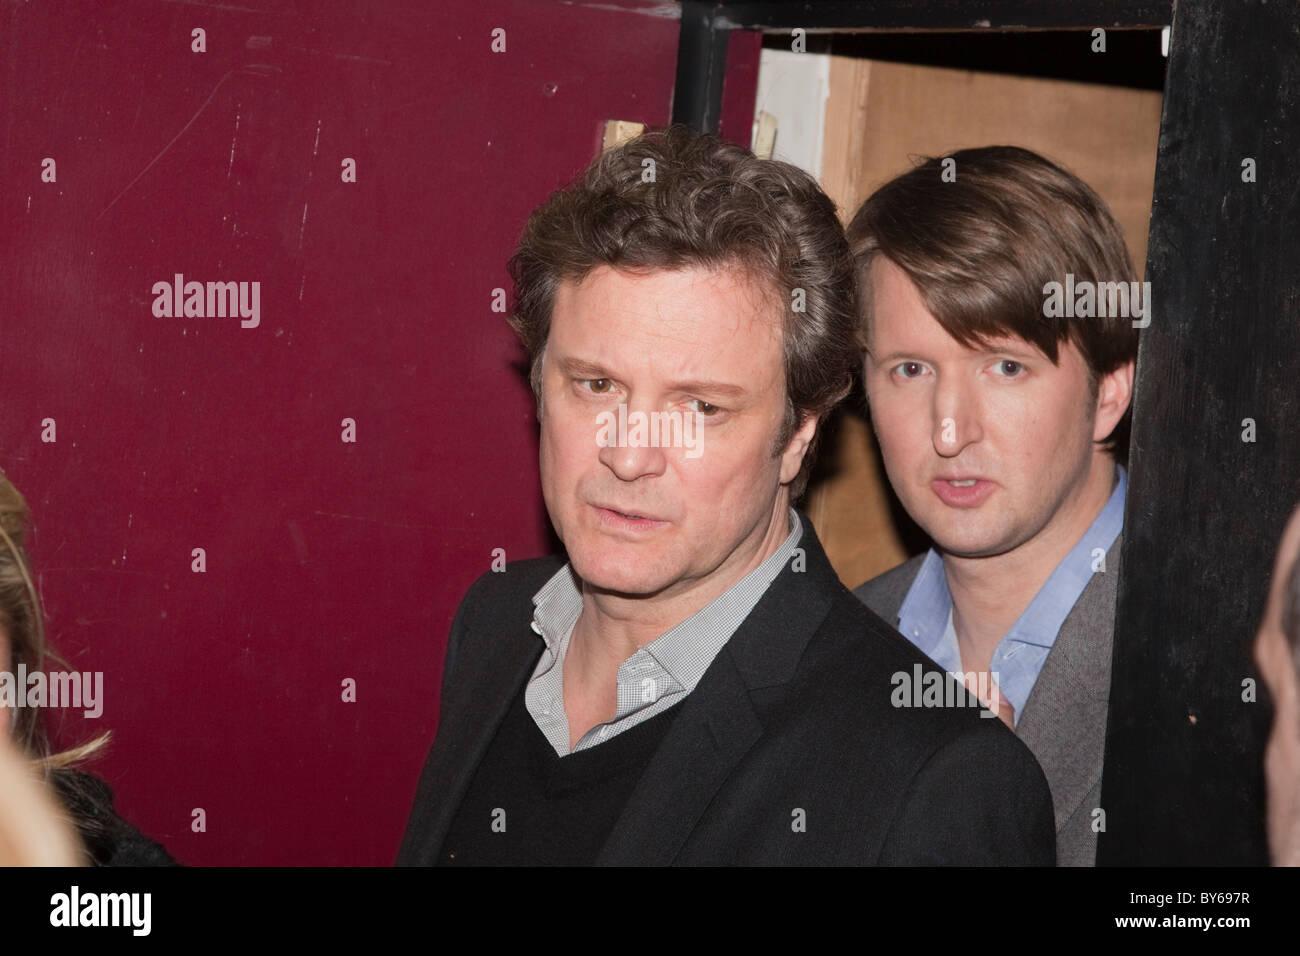 Schauspieler Colin Firth und Regisseur Tom Hooper an Q&A-Session an der Clapham Picturehouse Kino Stockbild